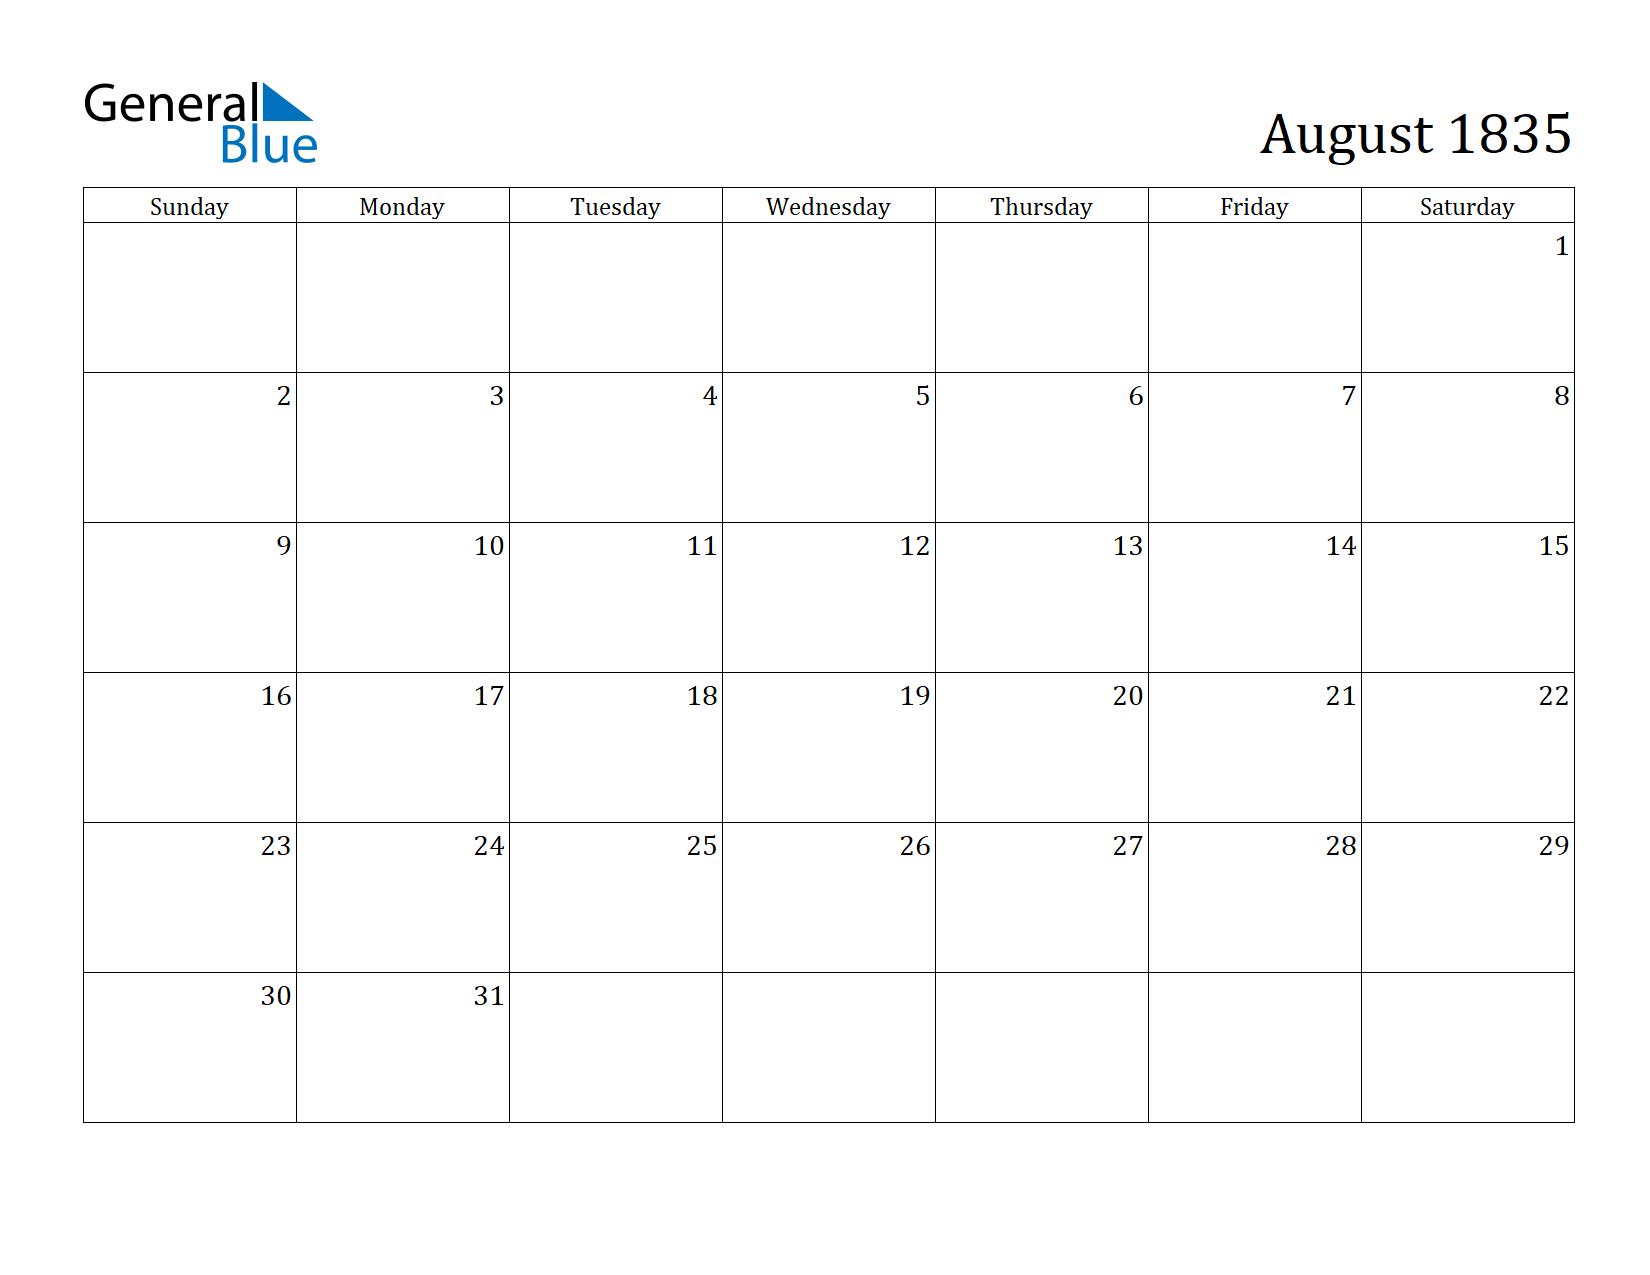 Image of August 1835 Calendar